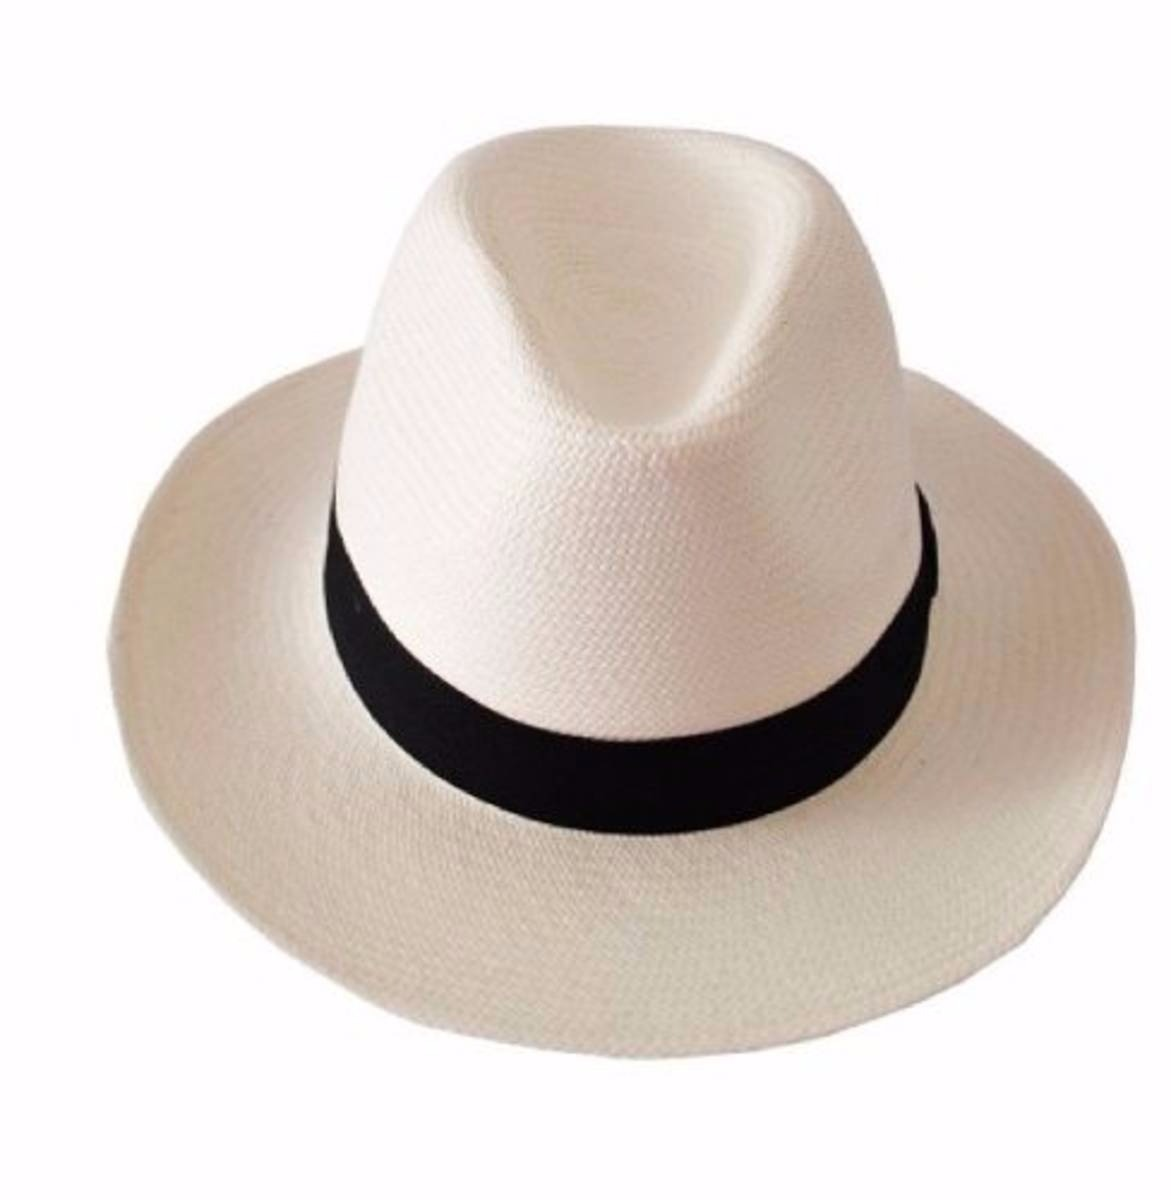 Chapéu Moda Panamá Aba Larga Casual Praia Masculino Feminino - R  24 ... 0be00af2c87